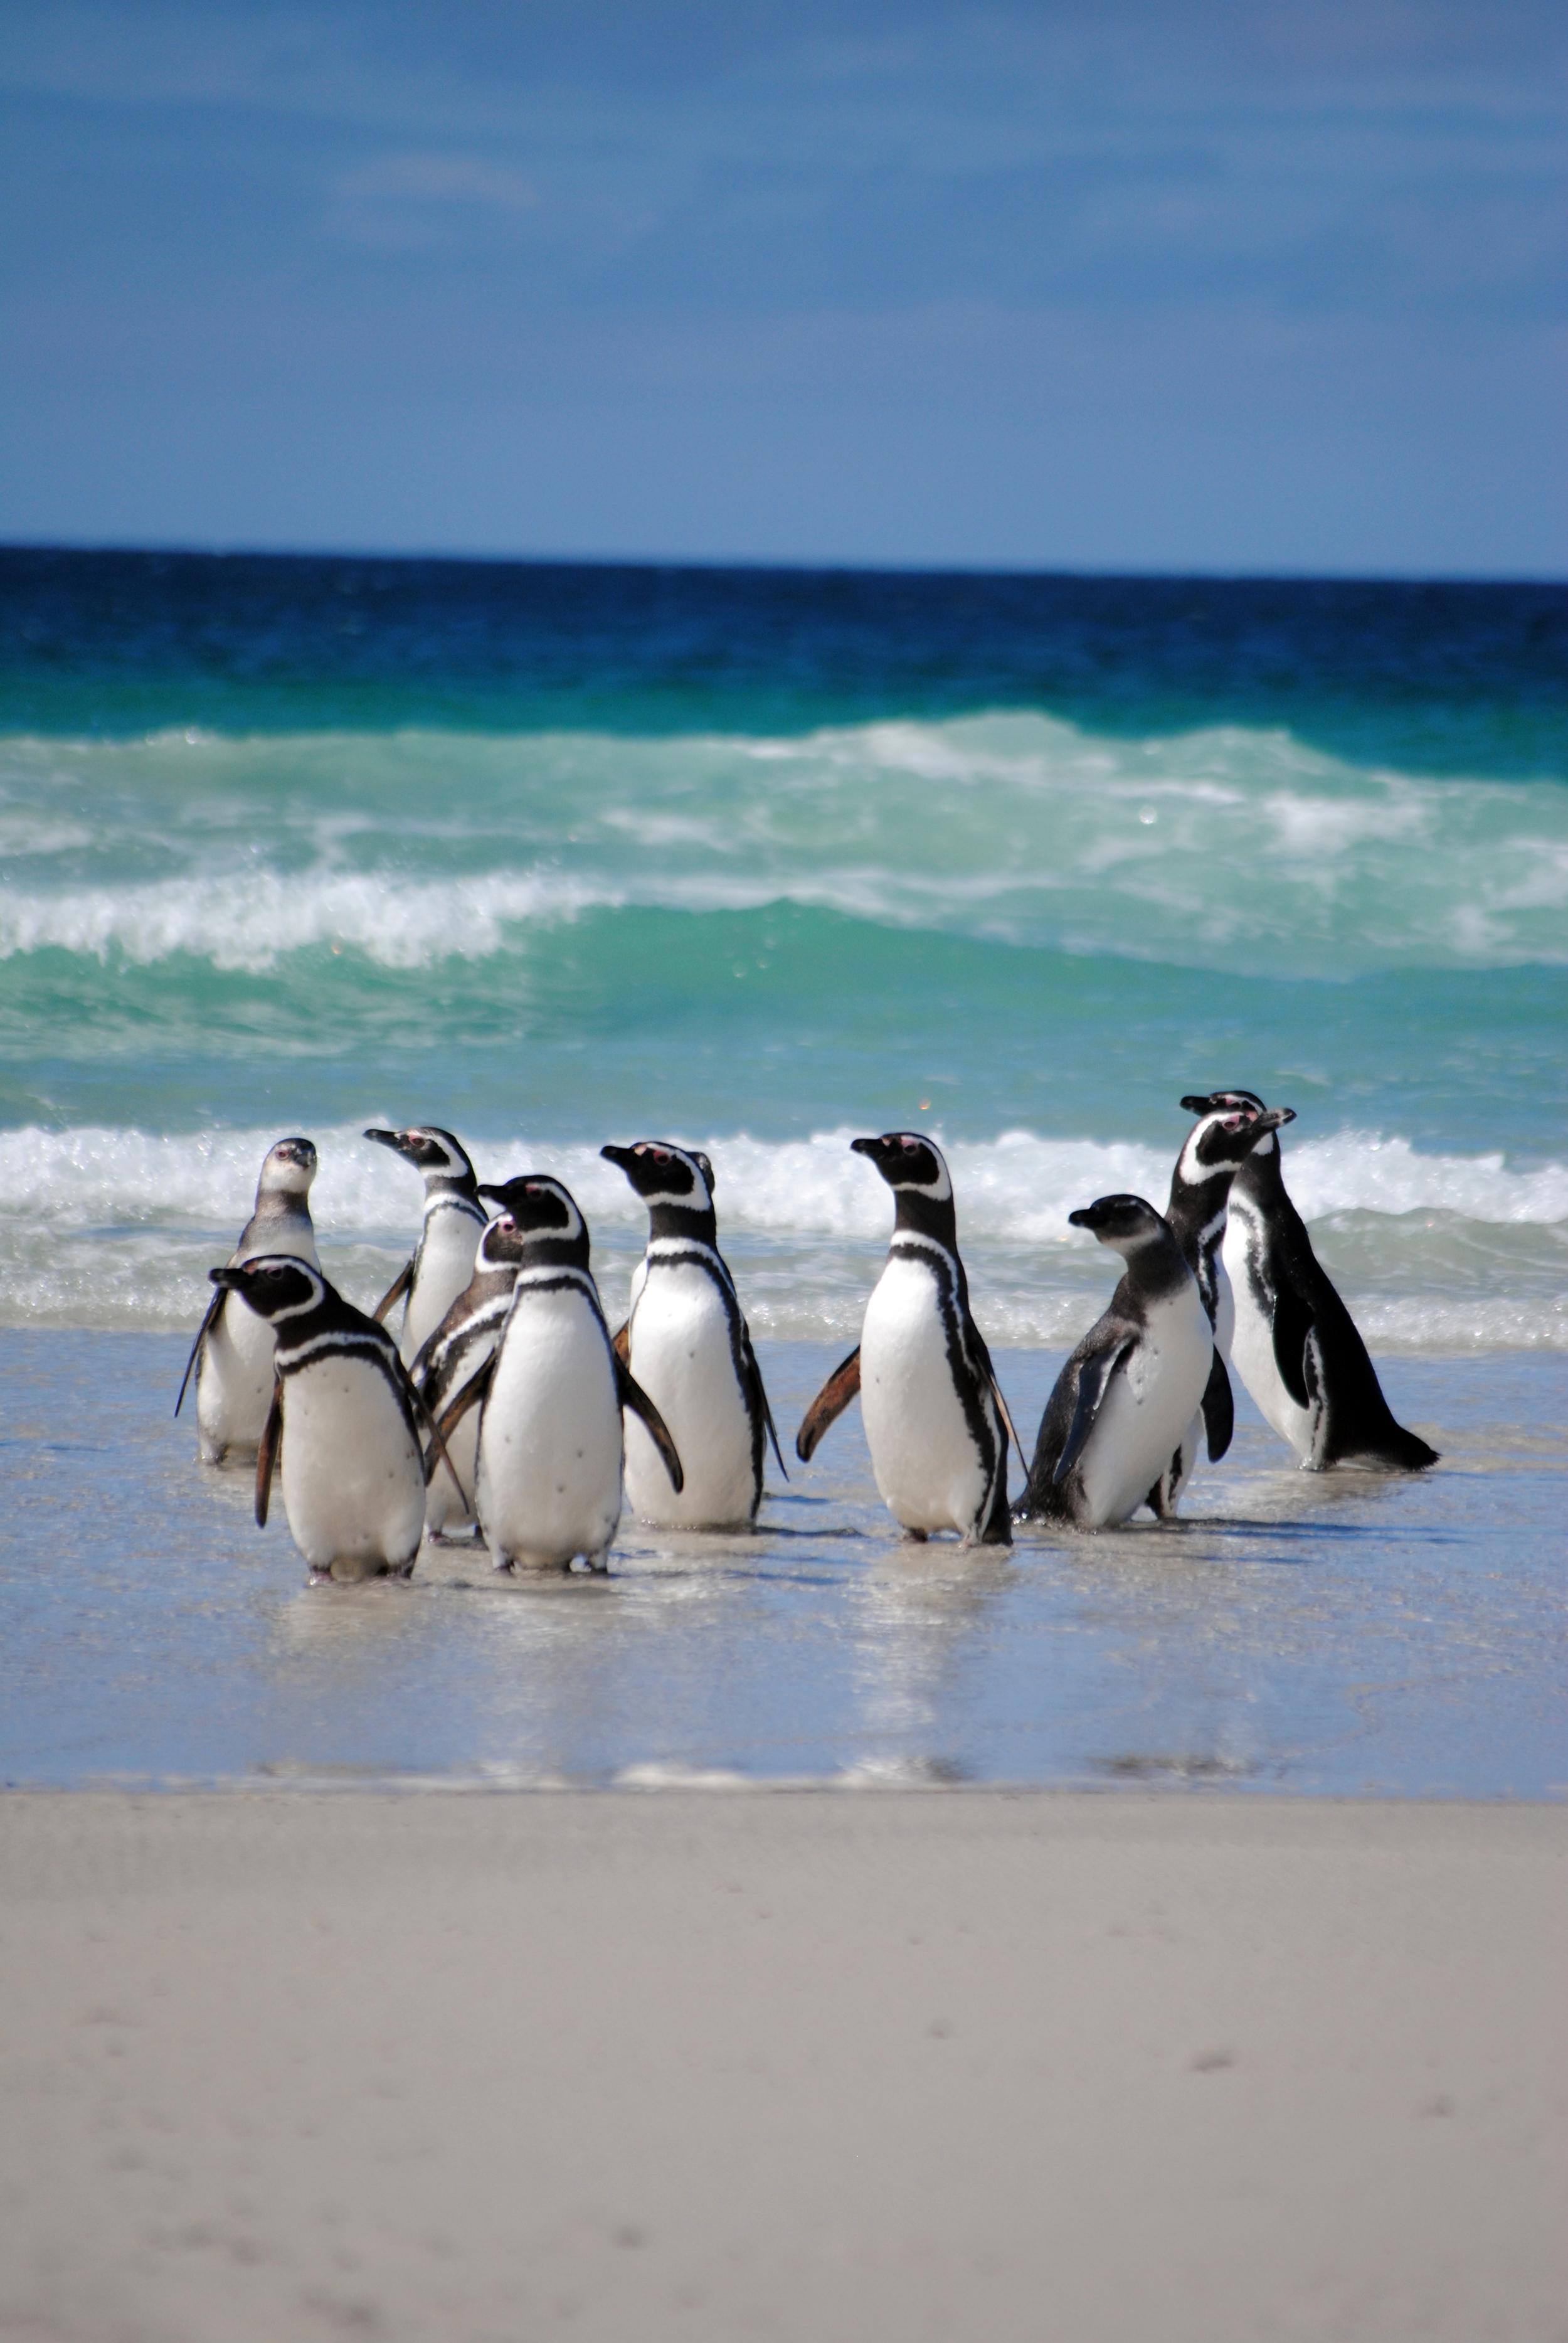 Falkland Islands, Saunders Island - Maggie a la Mode